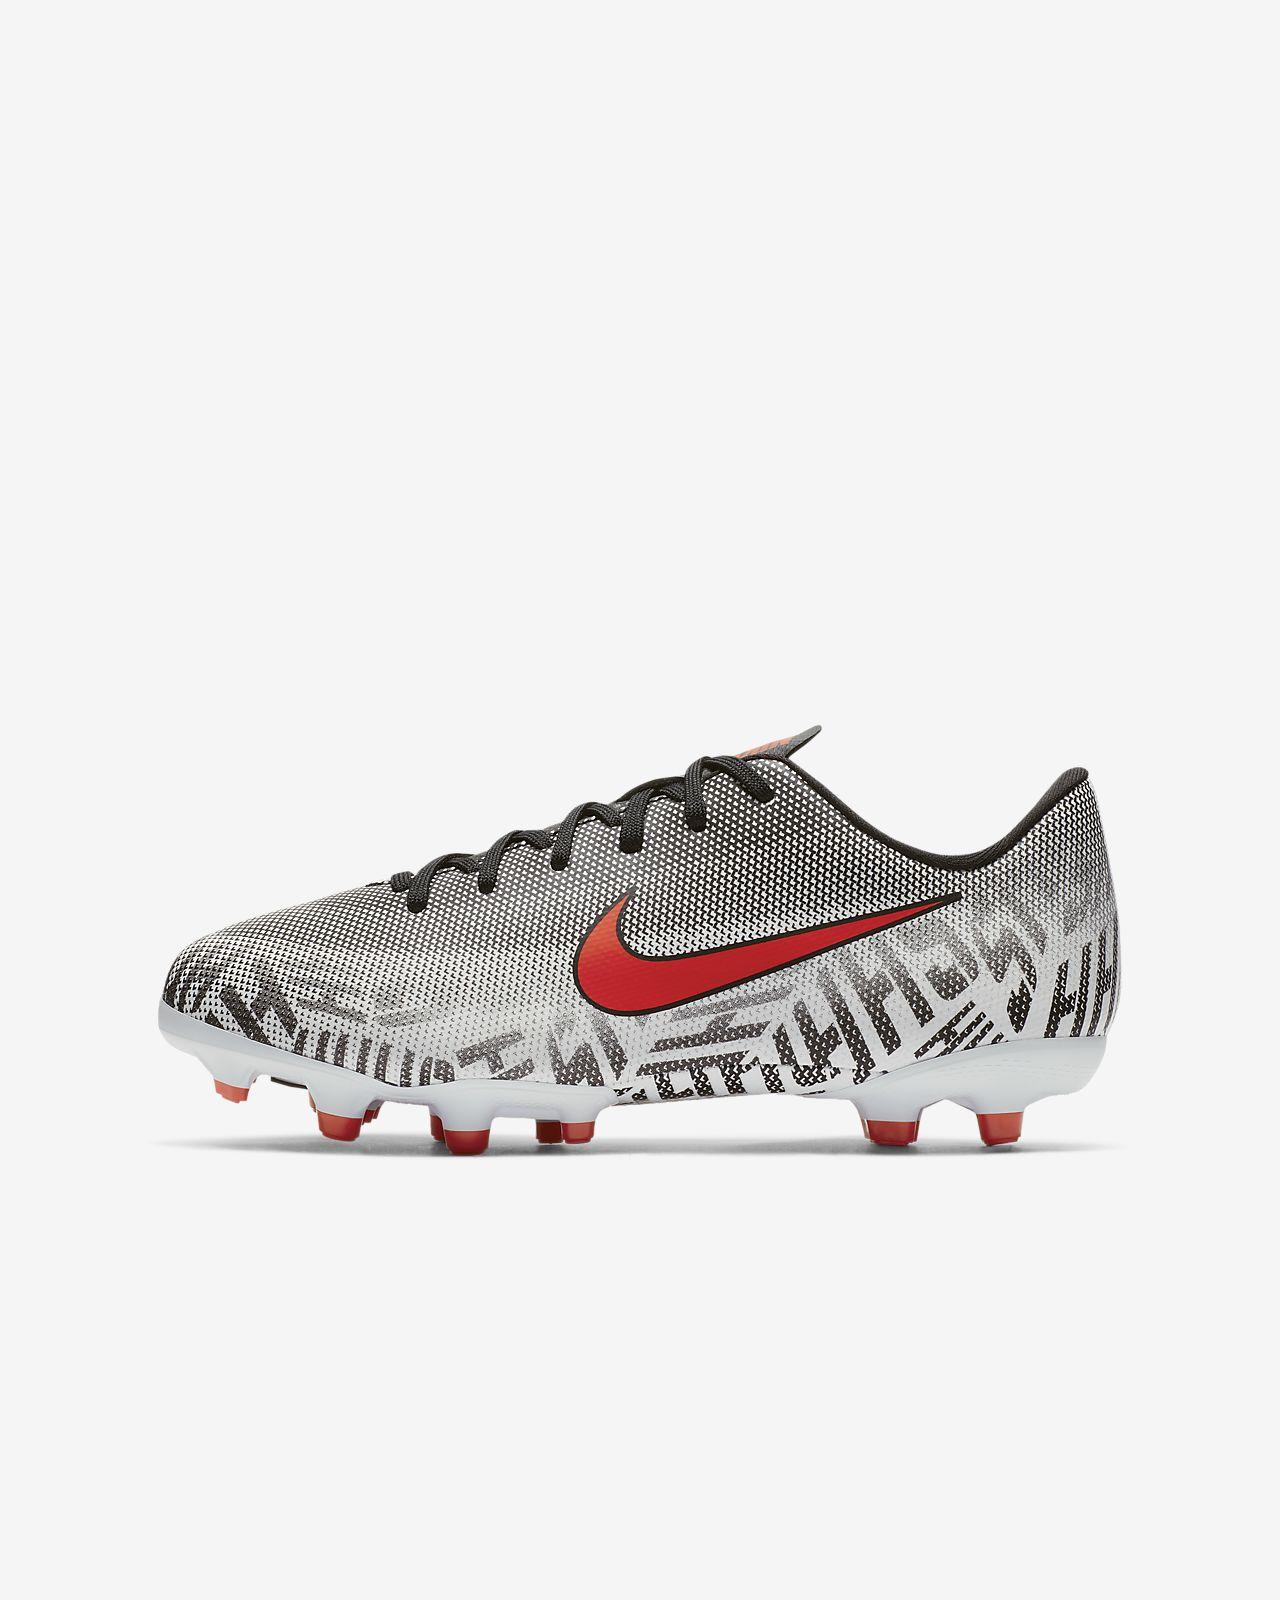 ff0c82a9f589e ... Nike Jr. Mercurial Vapor XII Academy Neymar Jr Botas de fútbol para  múltiples superficies -